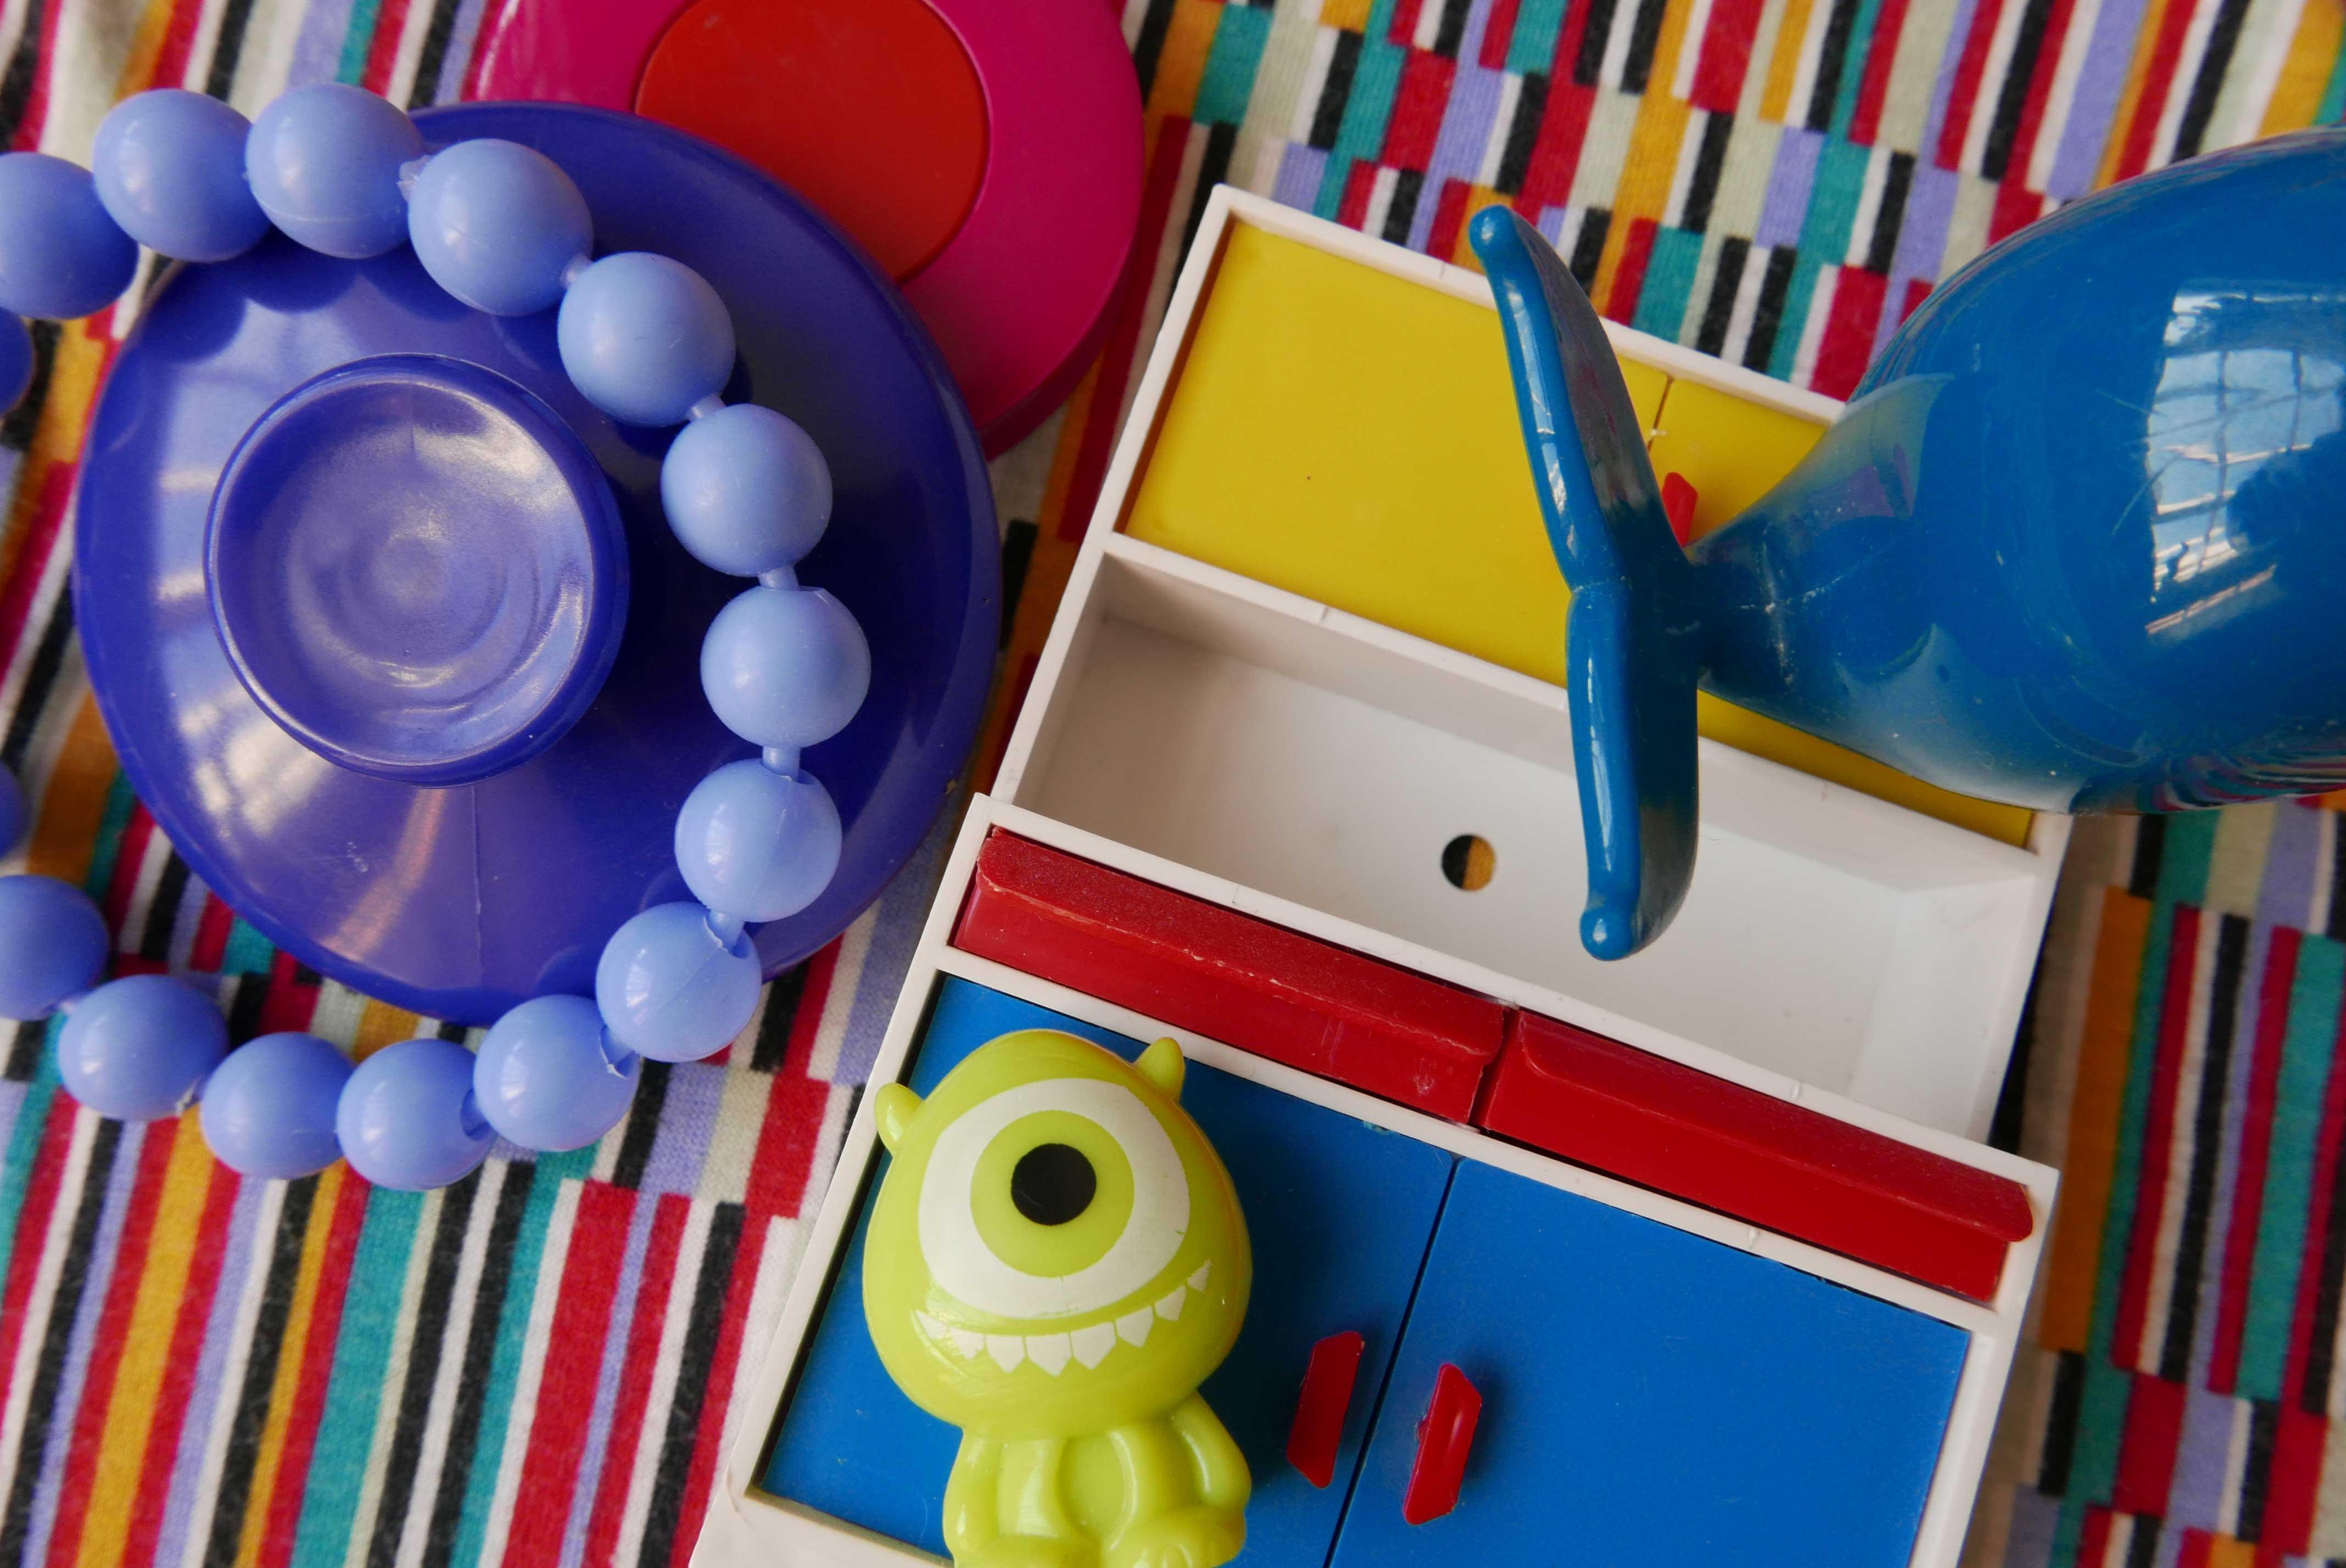 Spielzeug aus Plastik